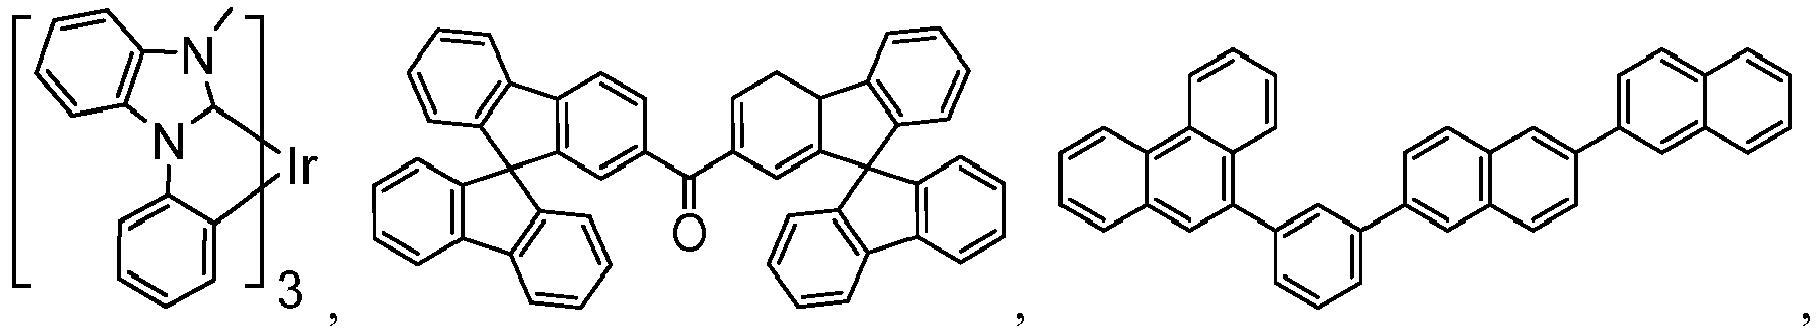 Figure imgb0906